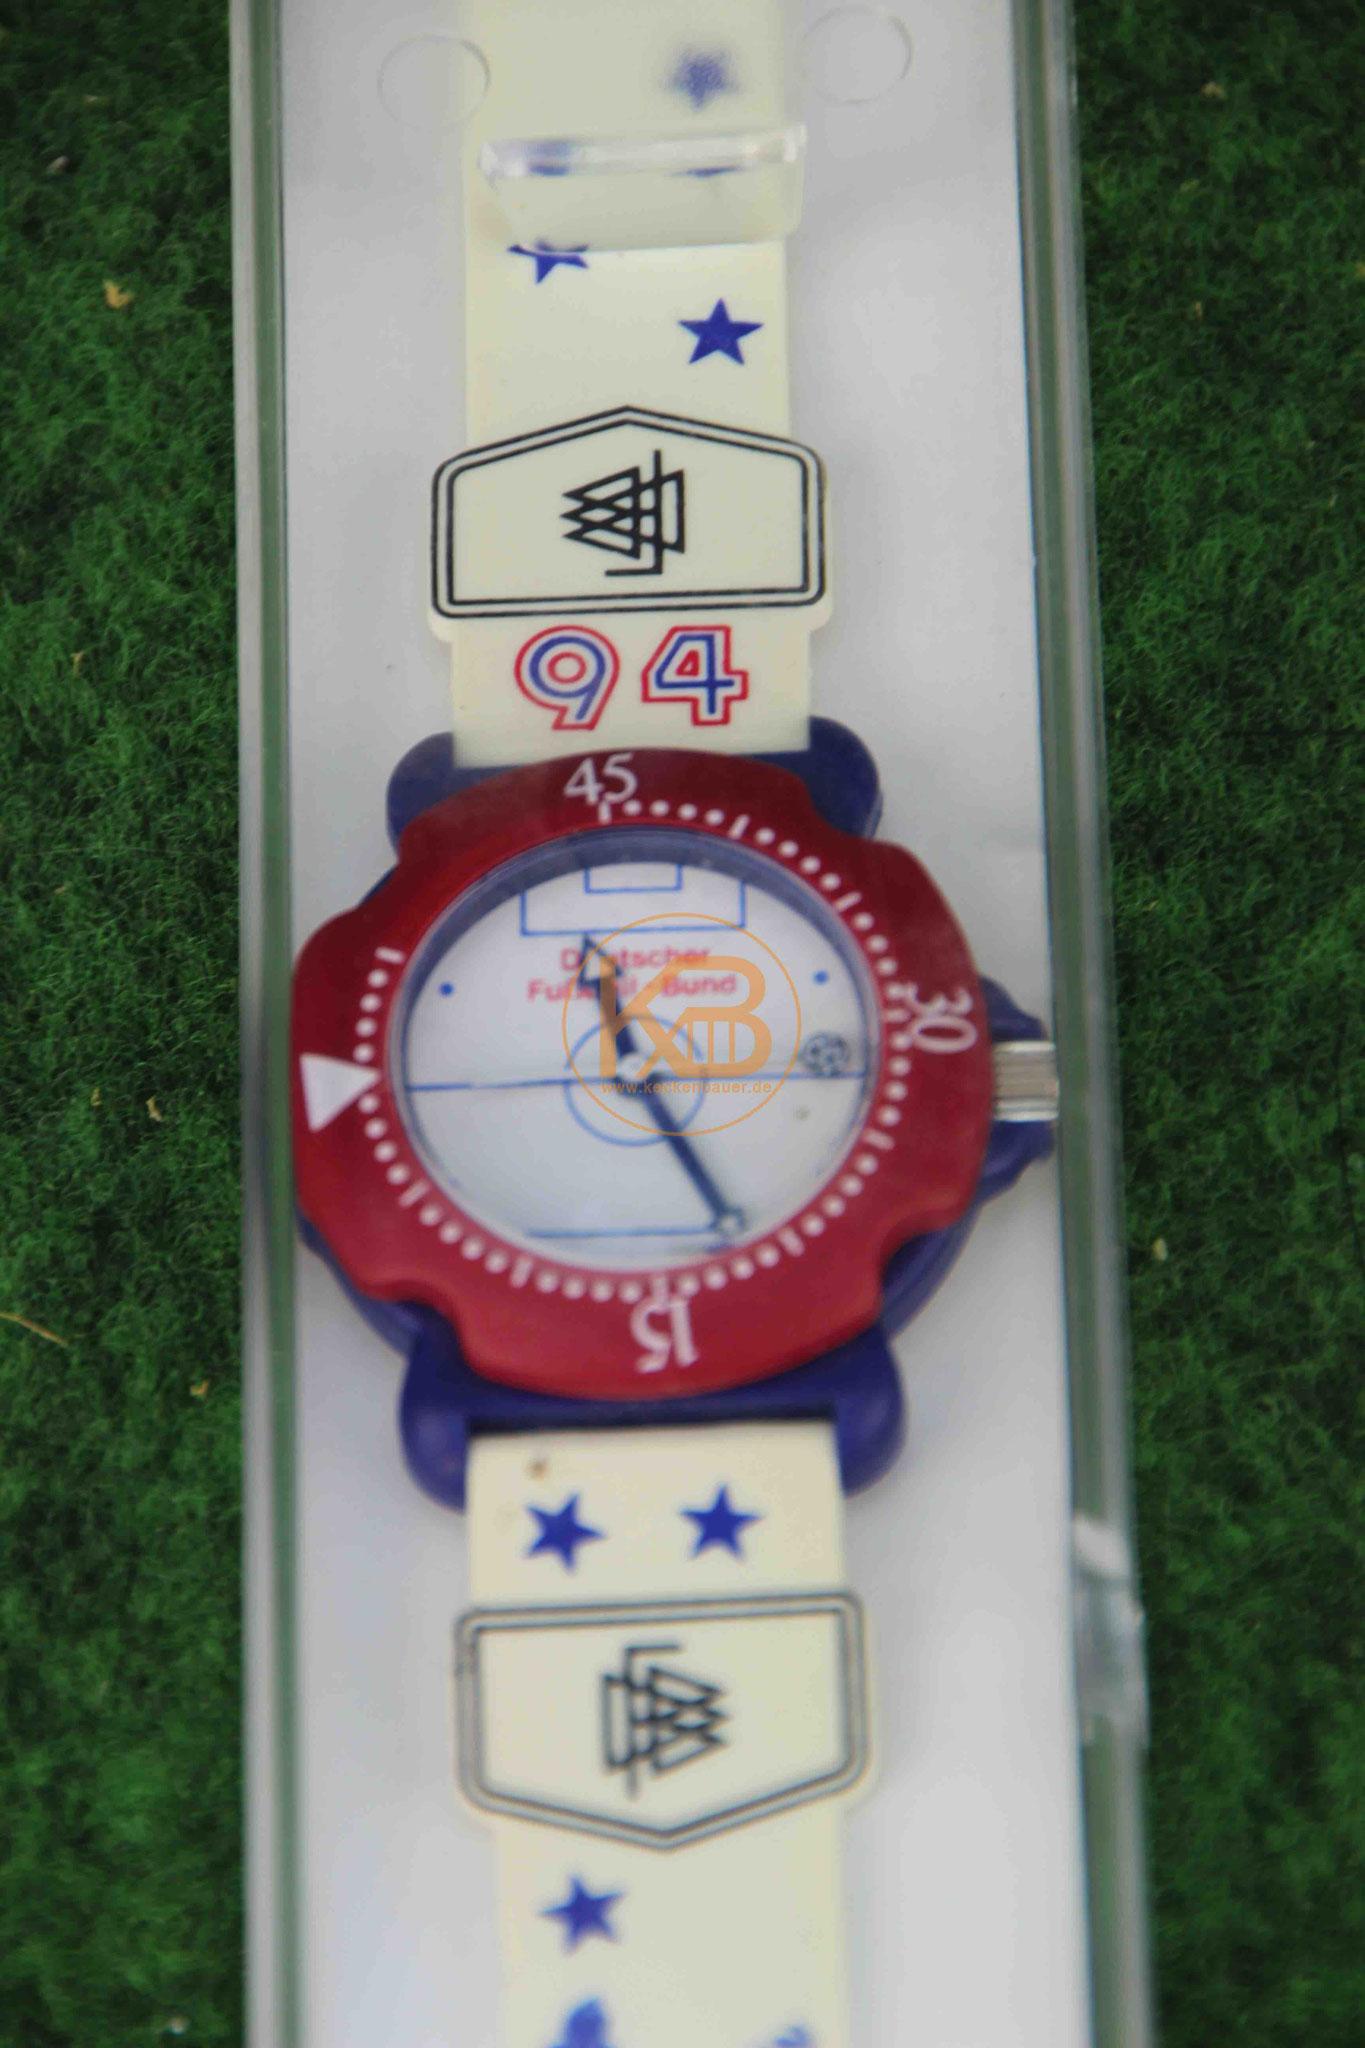 DFB -Armbanduhr zu WM 1994 in den USA 2/2